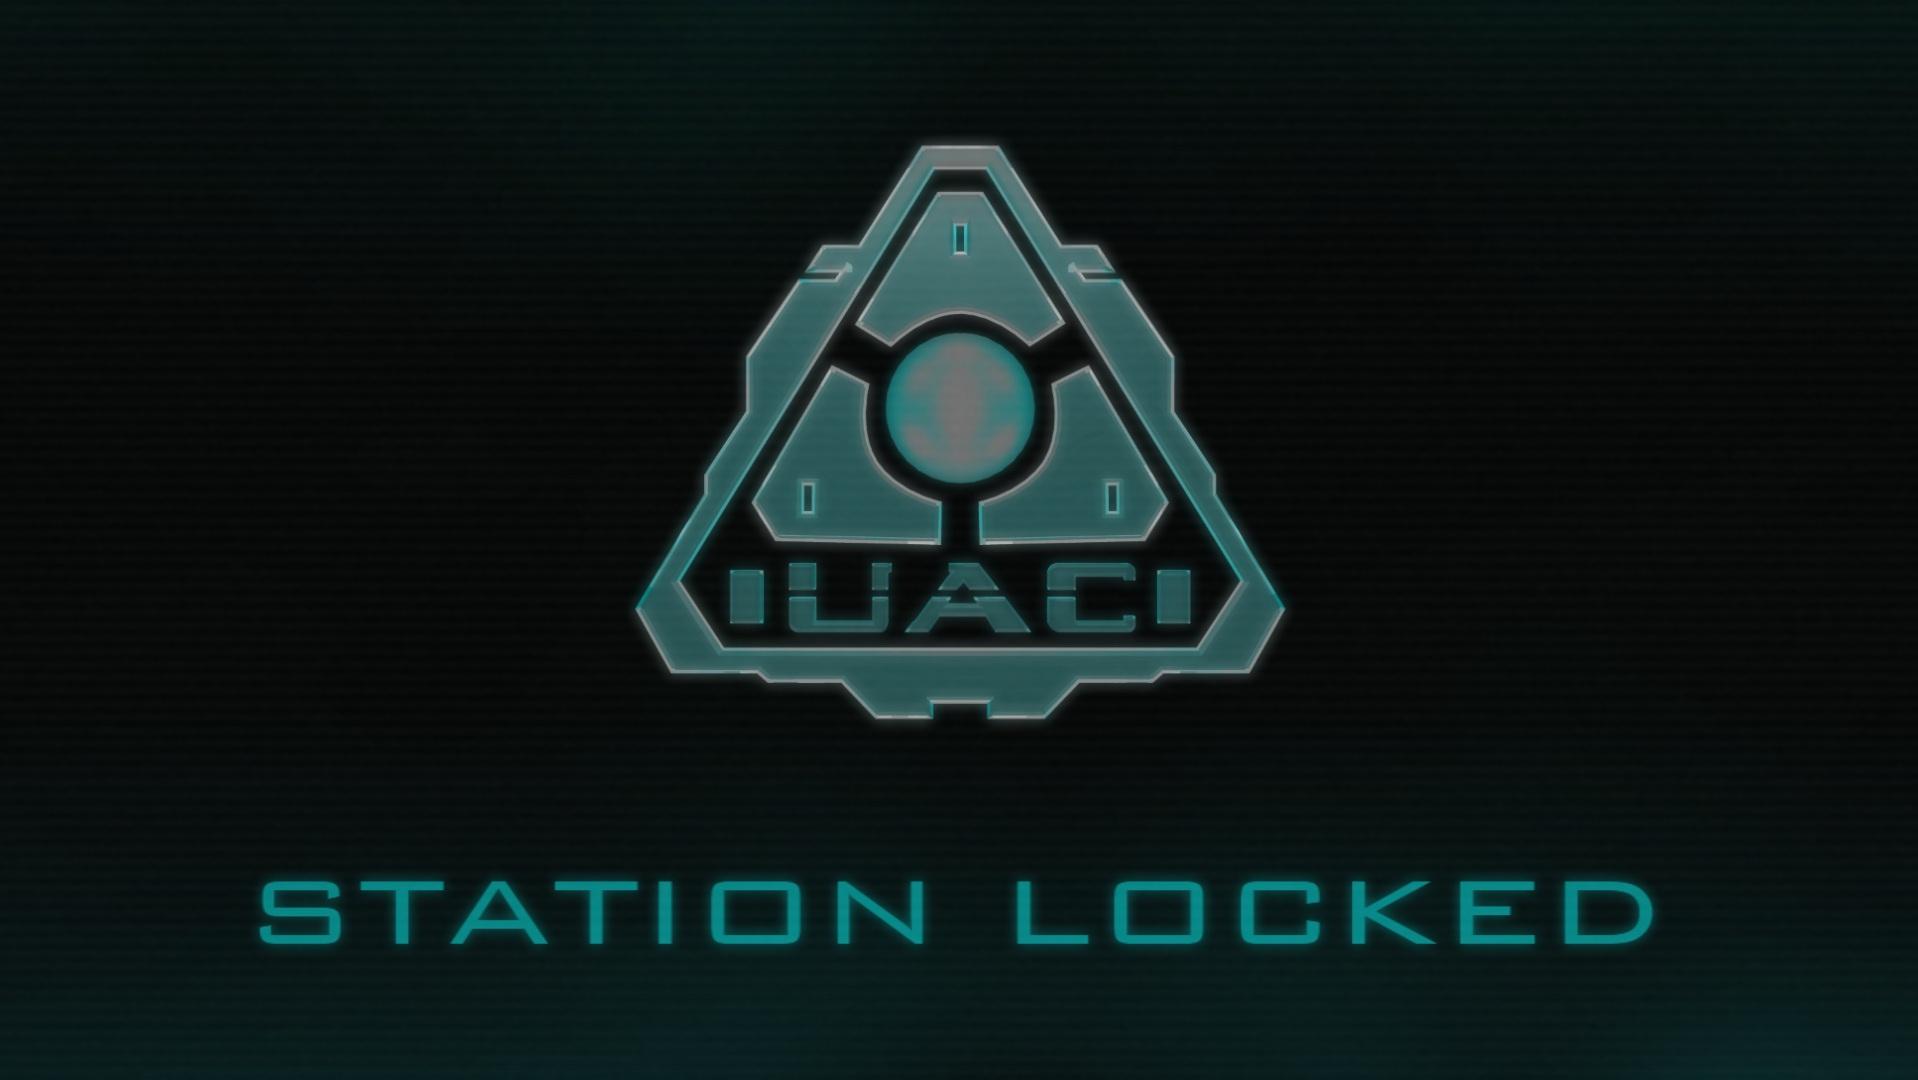 uac station locked screensaver by yuukiminoru on deviantart